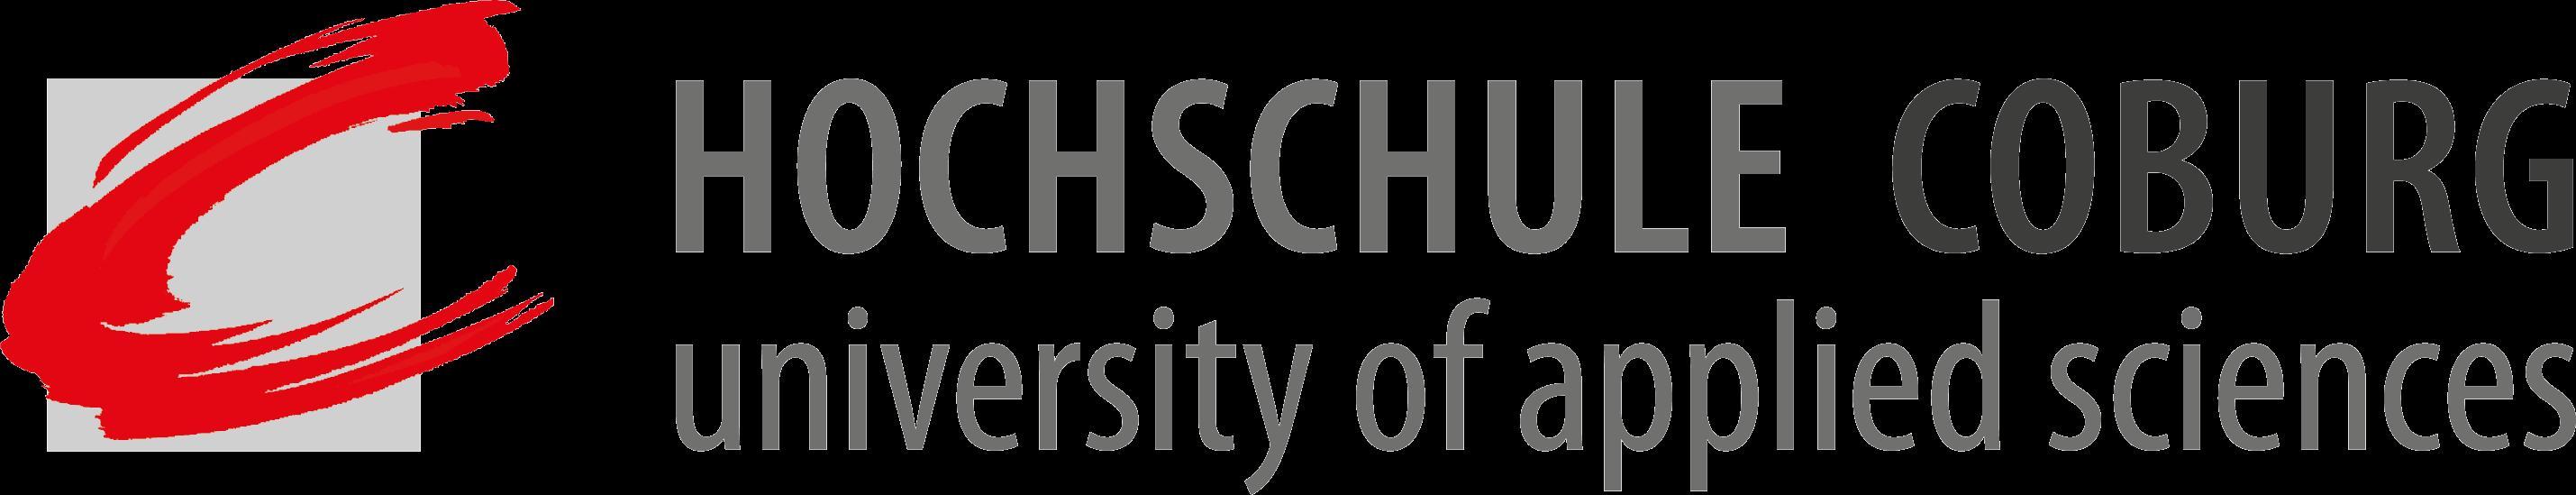 Coburg University of applied sciences